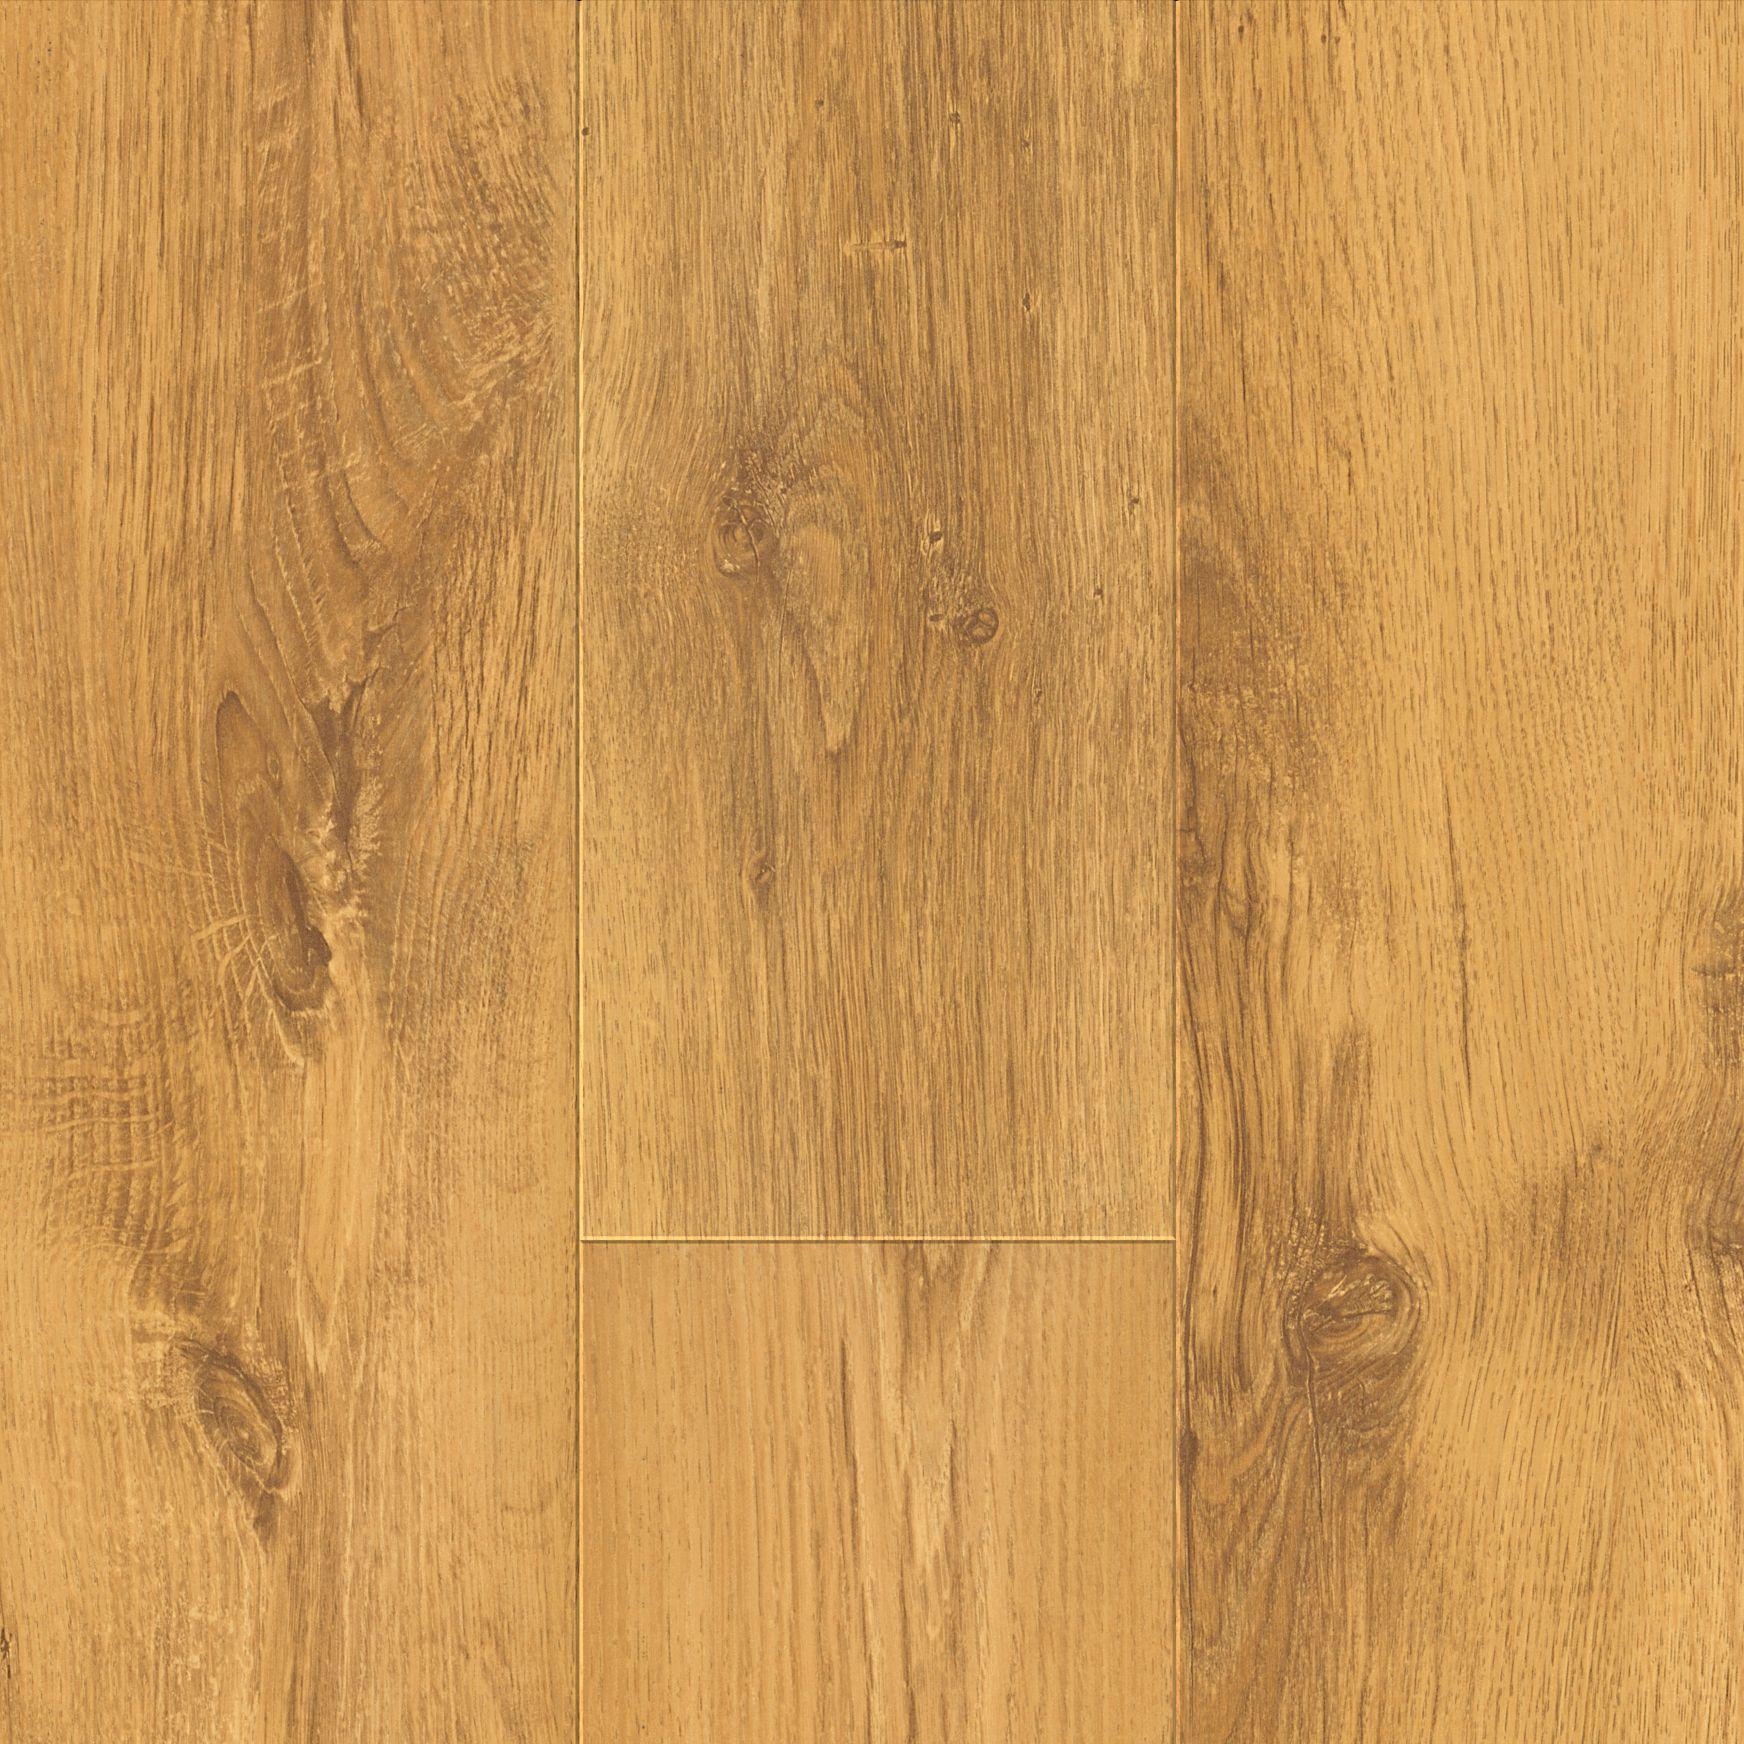 Aquateo Sutter Oak Effect Waterproof Laminate Flooring 2 M² Pack Departments Diy At B Q